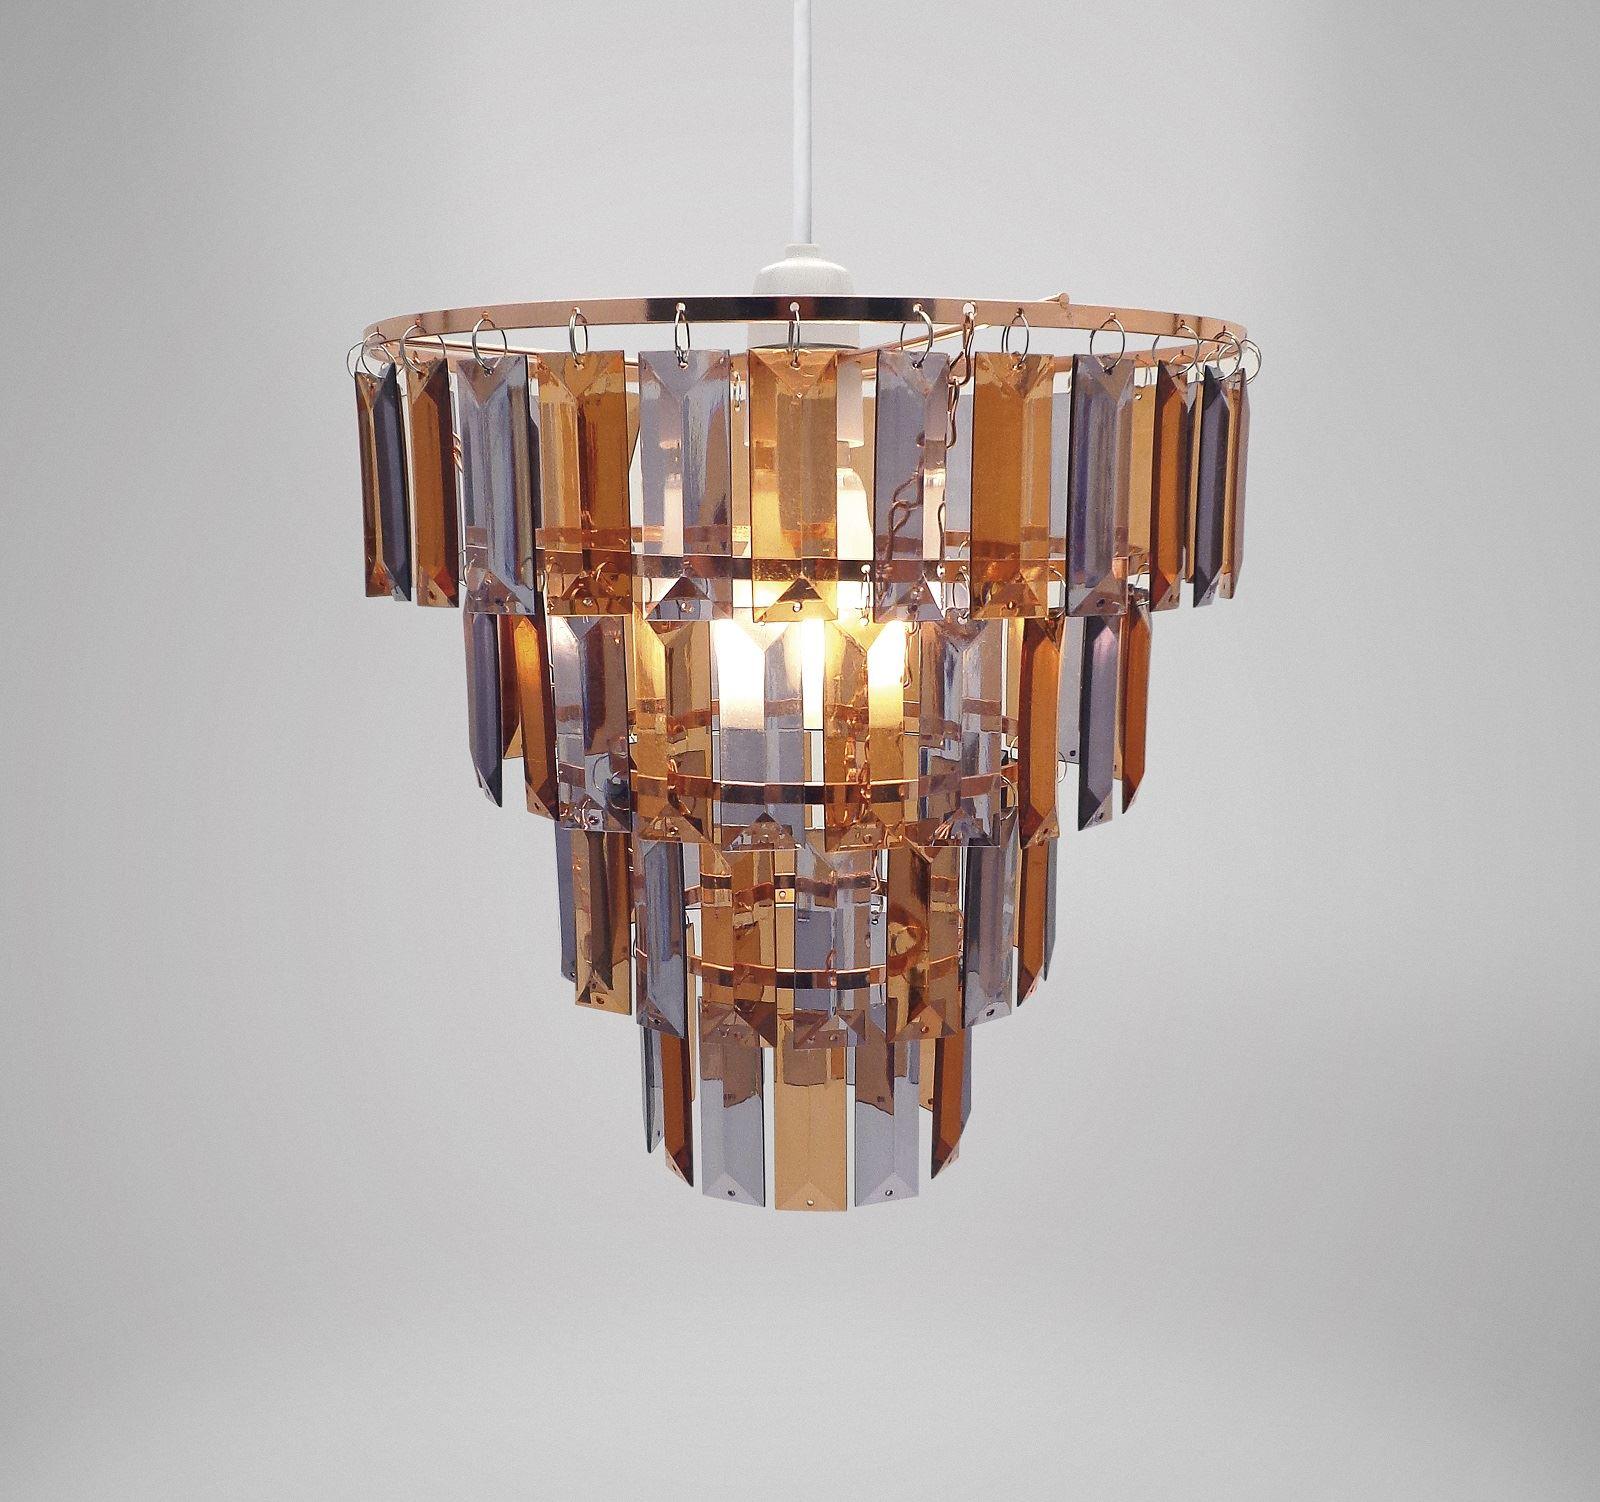 Easy Fit Universal Gem Crystal Light Decoration Ceiling Lamp ...